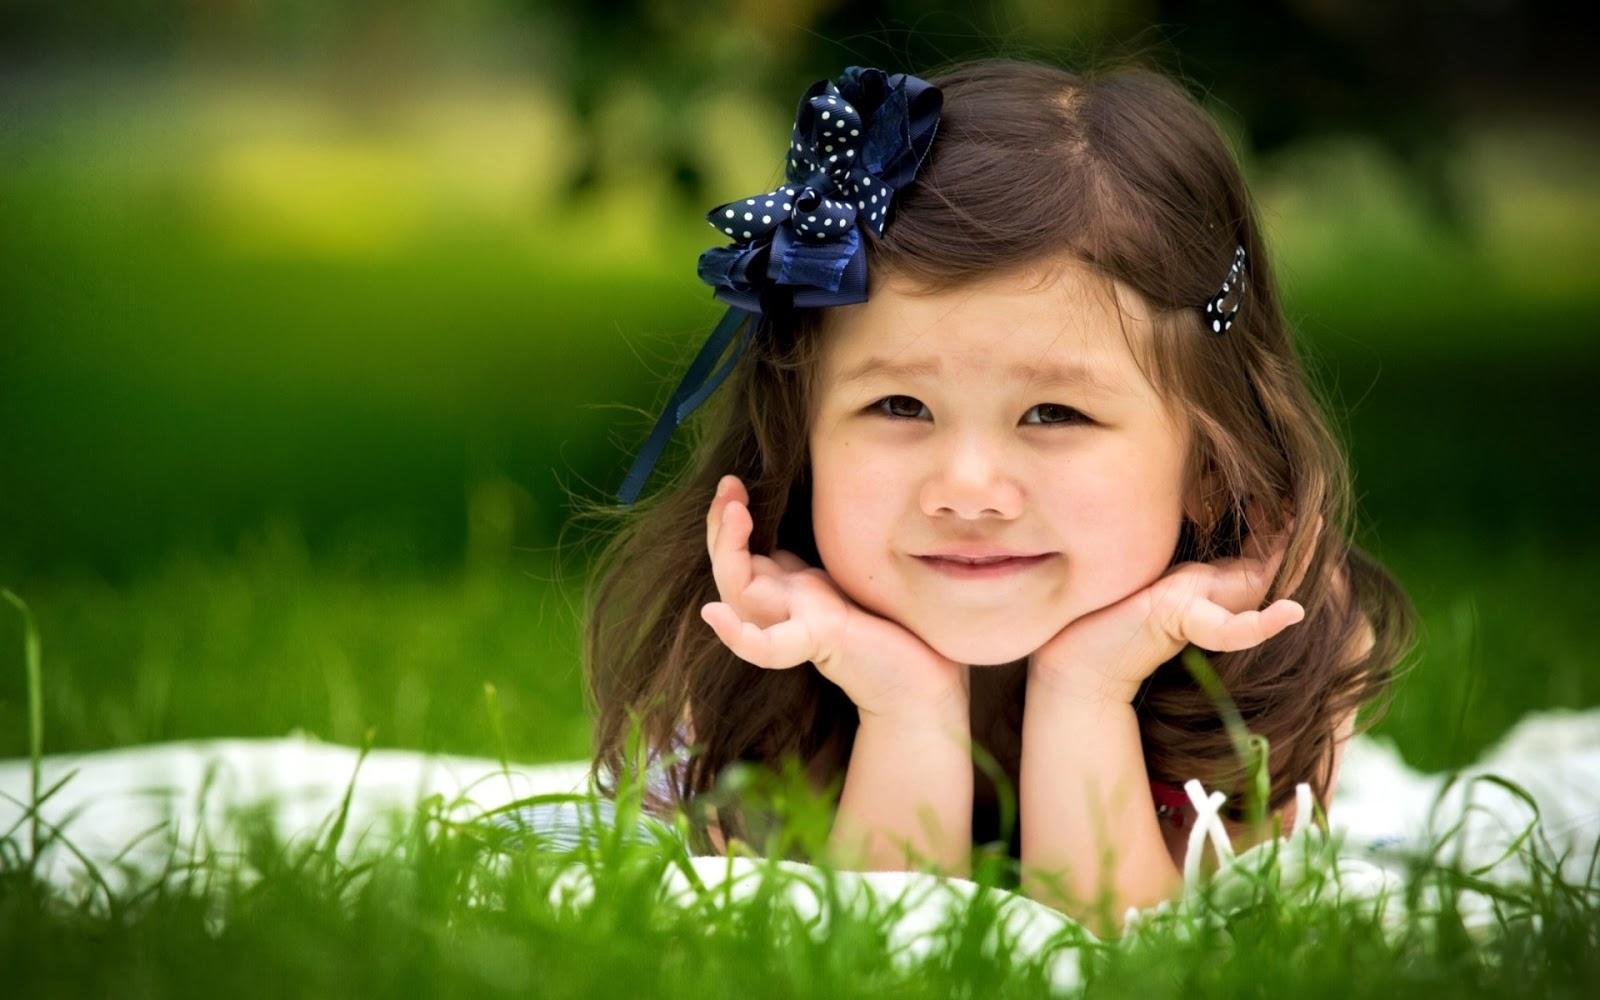 Sweet Girl Smiley Face